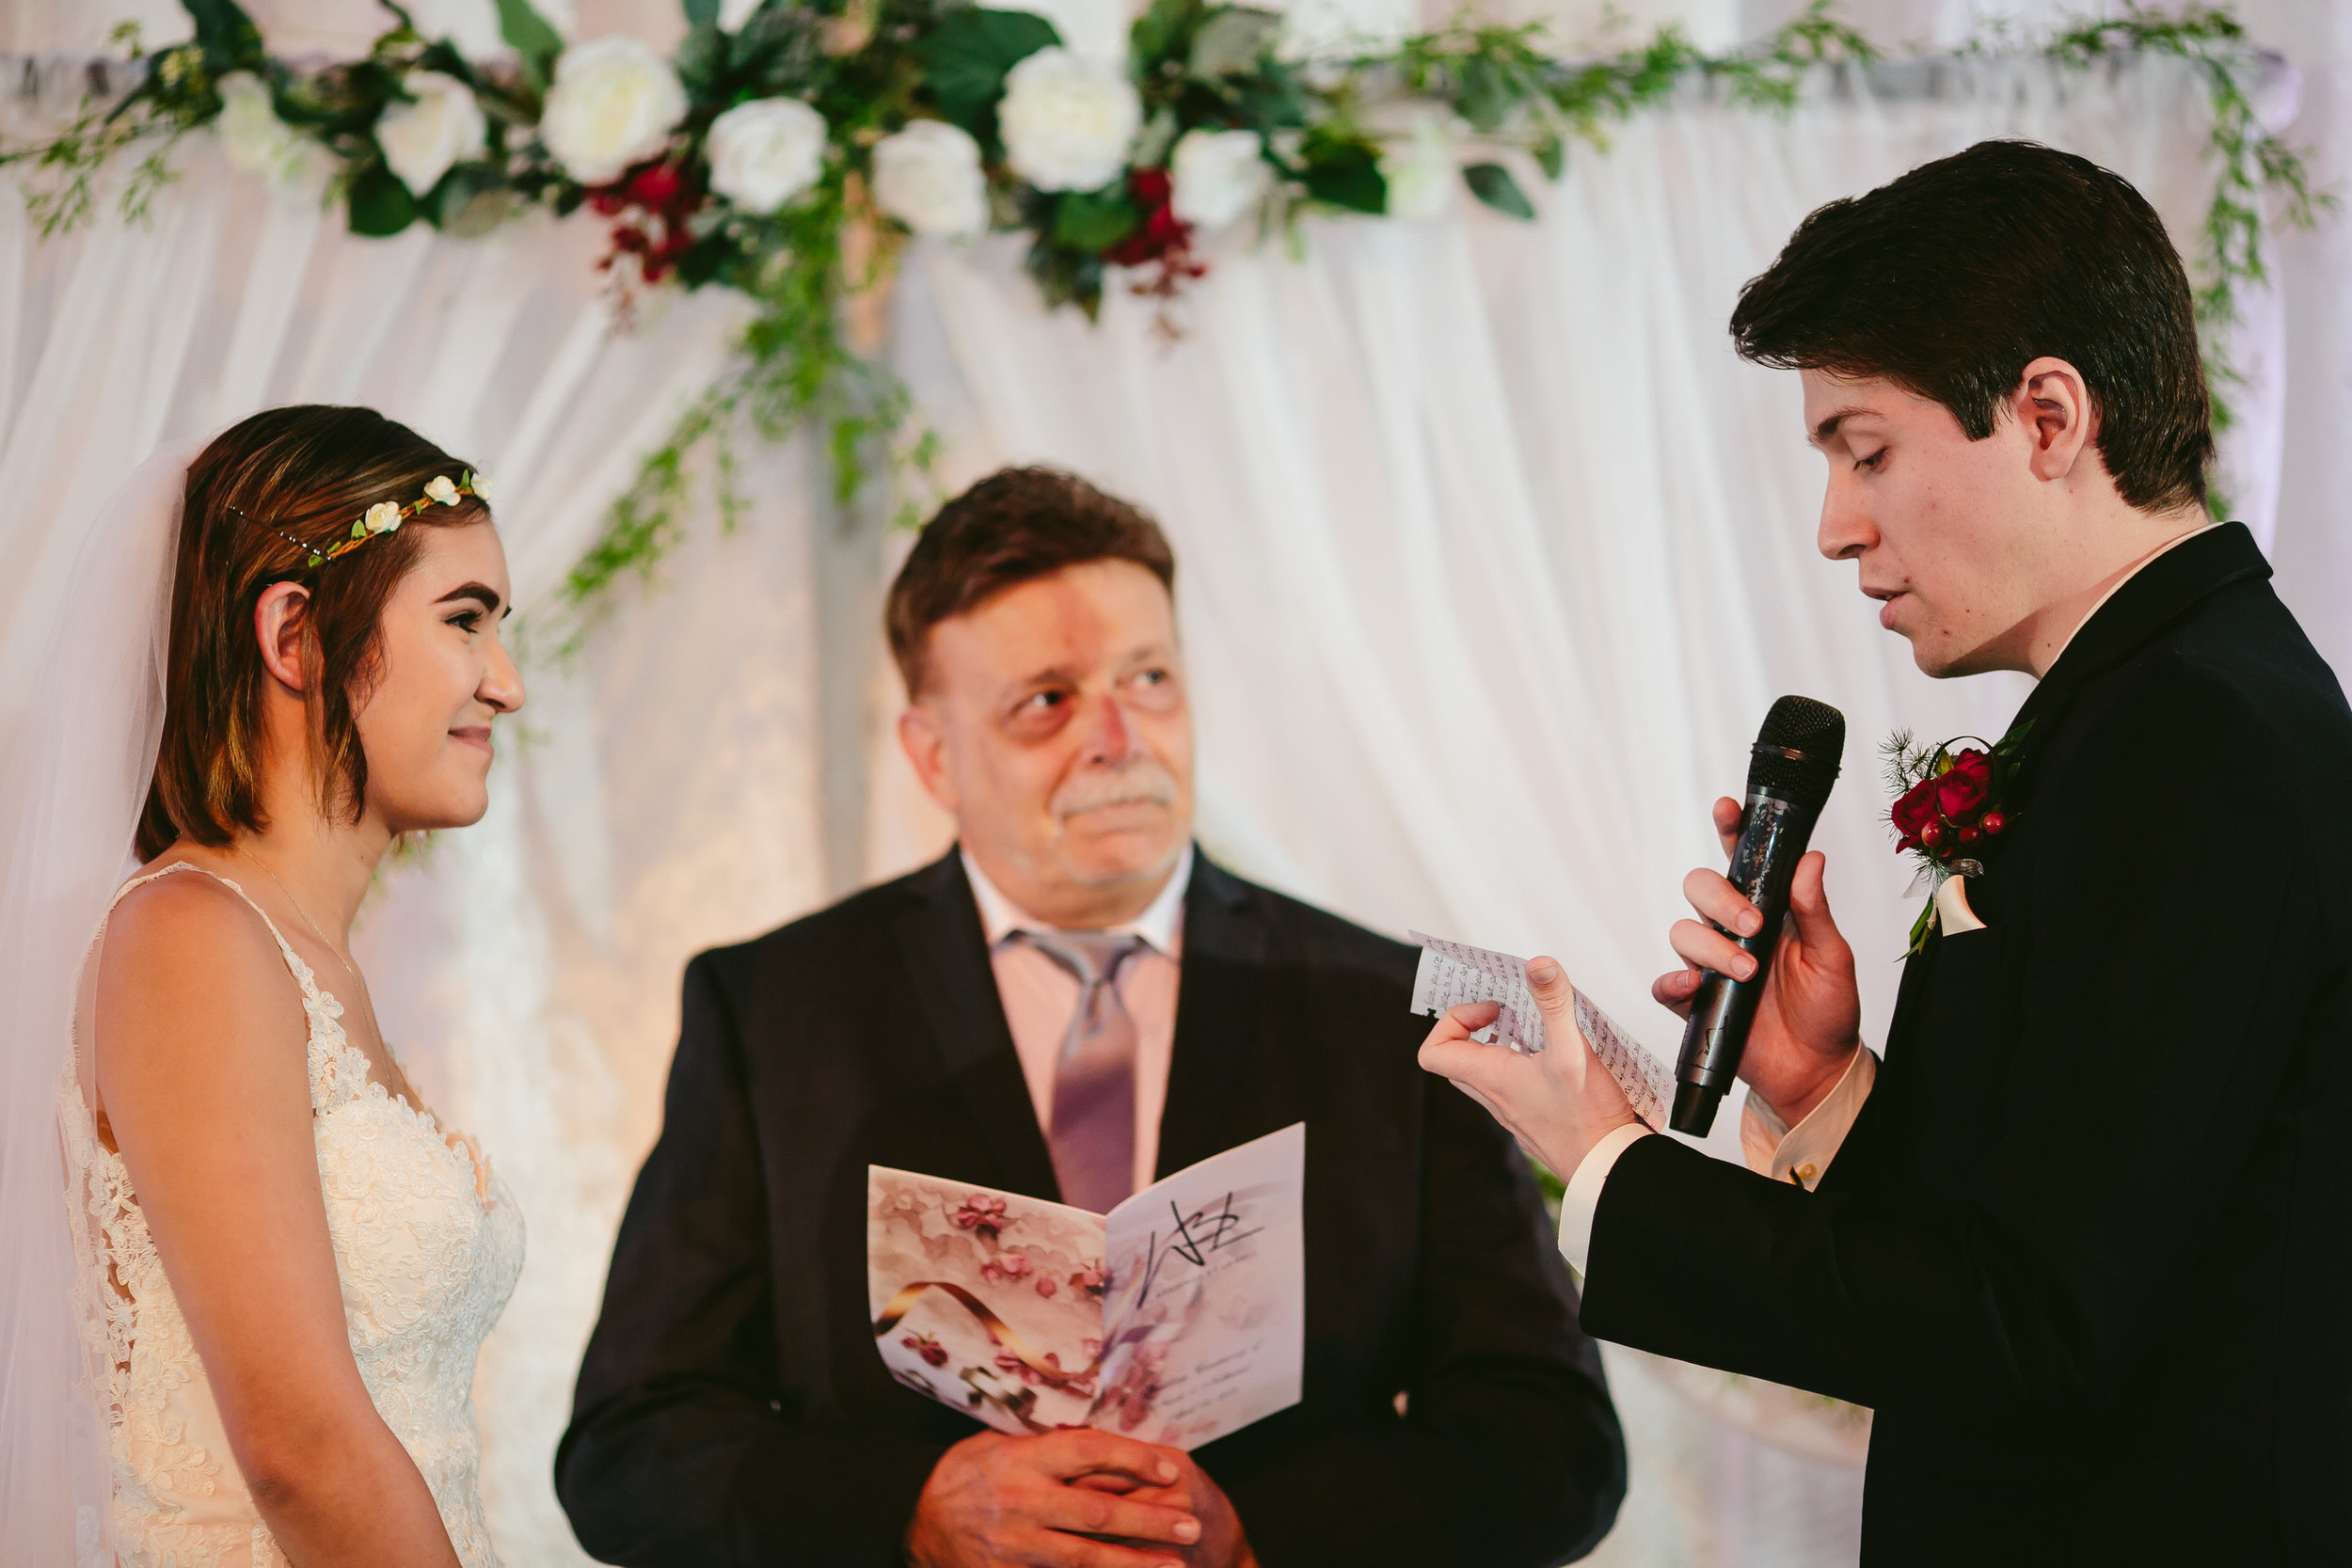 vows_wedding_ceremony_bride_groom_tiny_house_photo.jpg